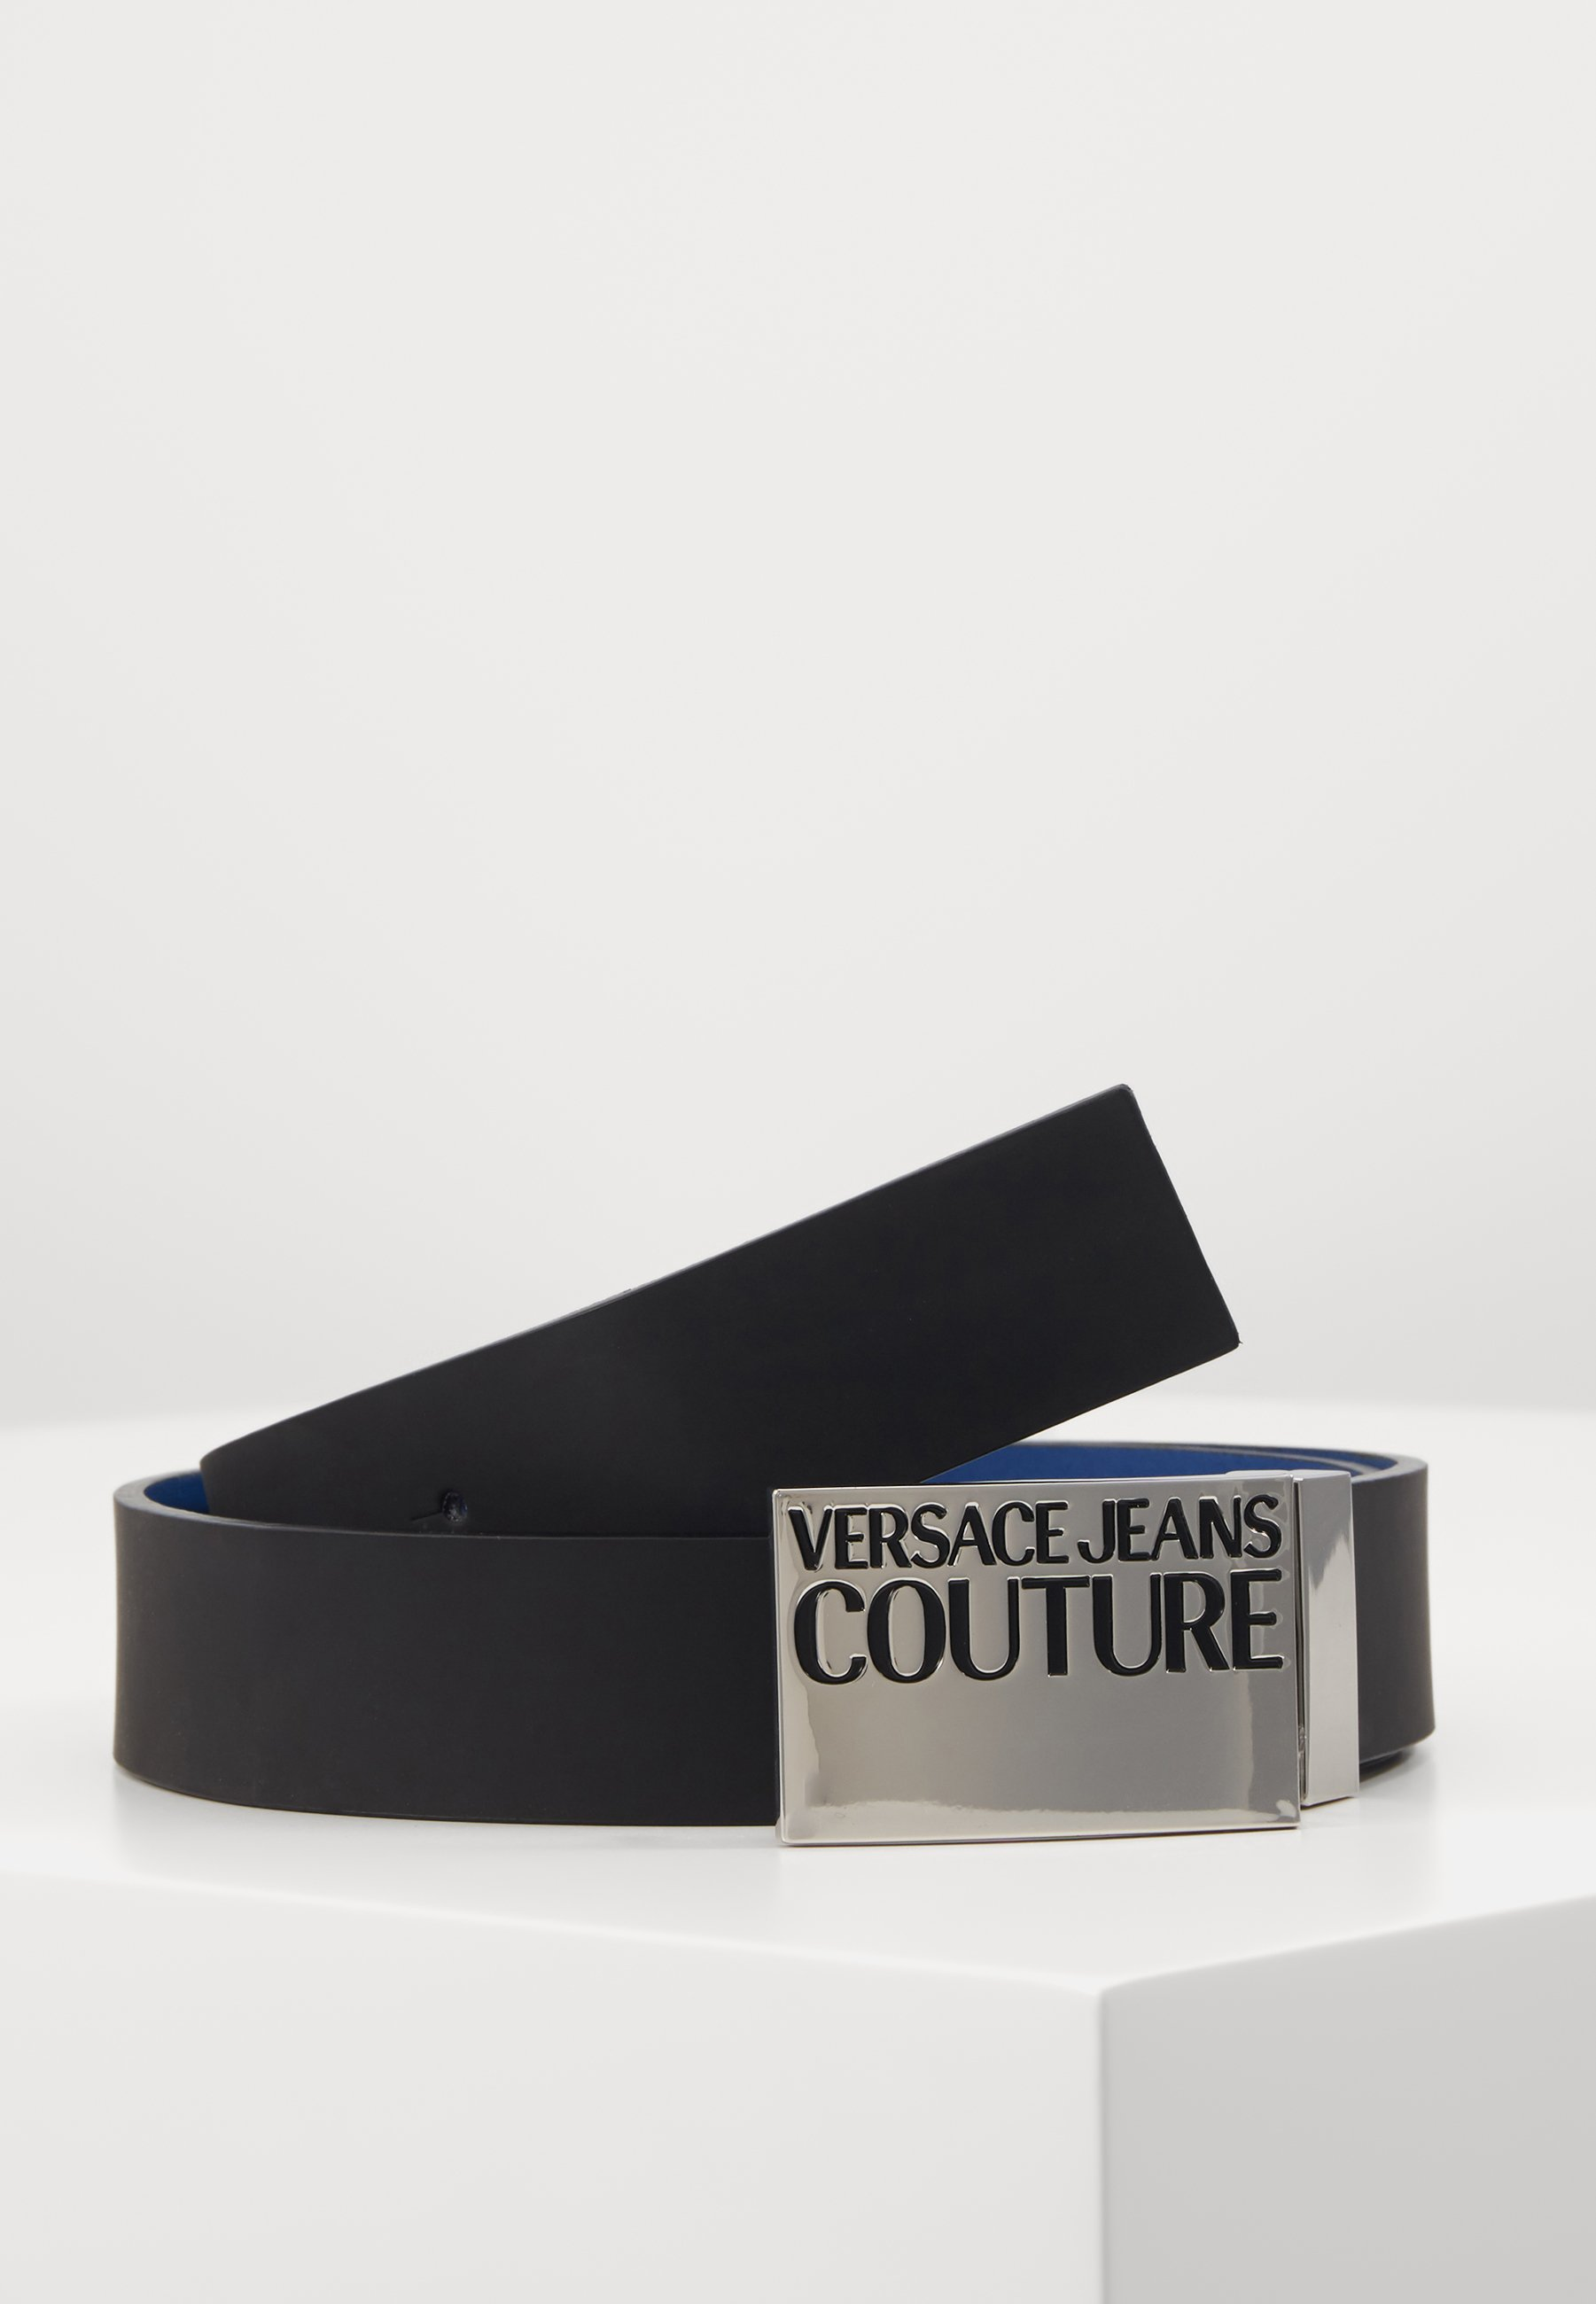 Versace Jeans Couture Belte - black/silver/dark blue/svart I6PGtLlmqn9N24K